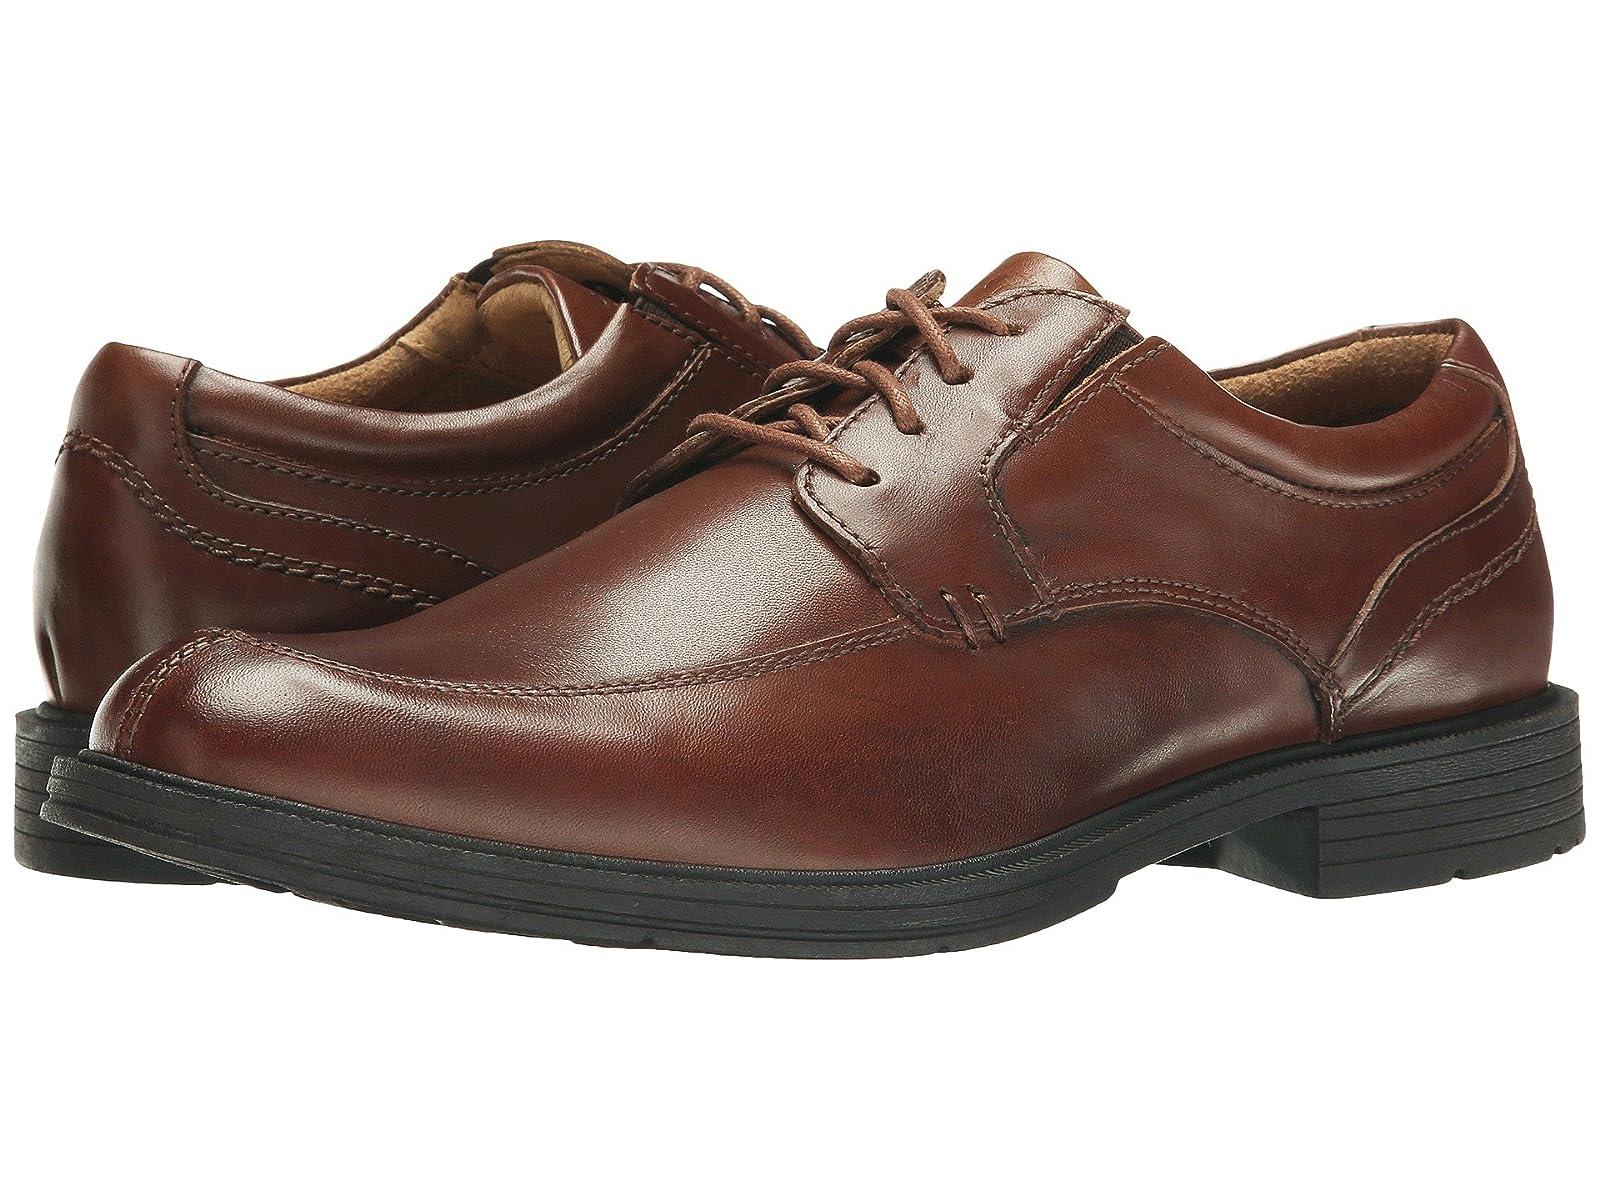 Florsheim Mogul Moc Toe OxfordCheap and distinctive eye-catching shoes